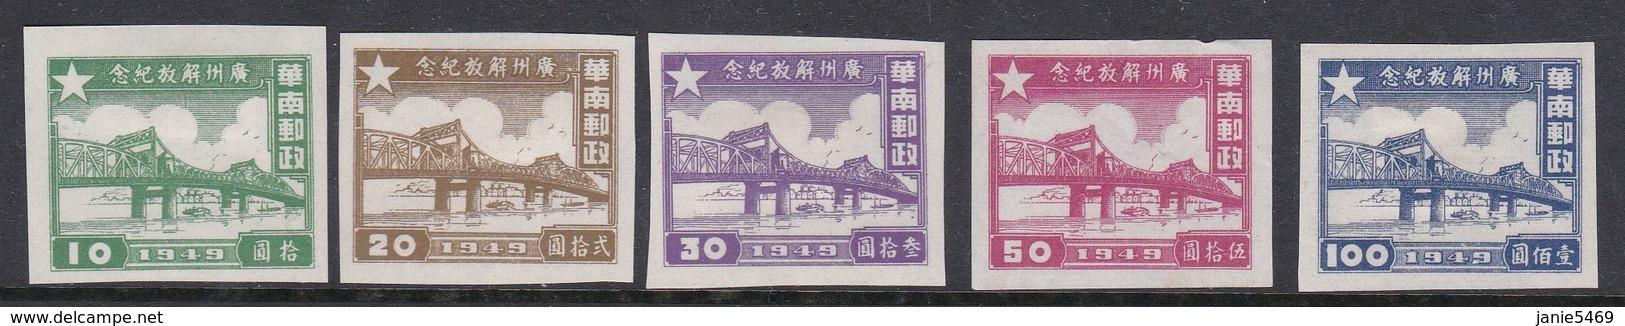 China South China Scott 7L1-7L5 1949 Pearl River Bridge, Mint Hinged - Chine Du Sud 1949-50